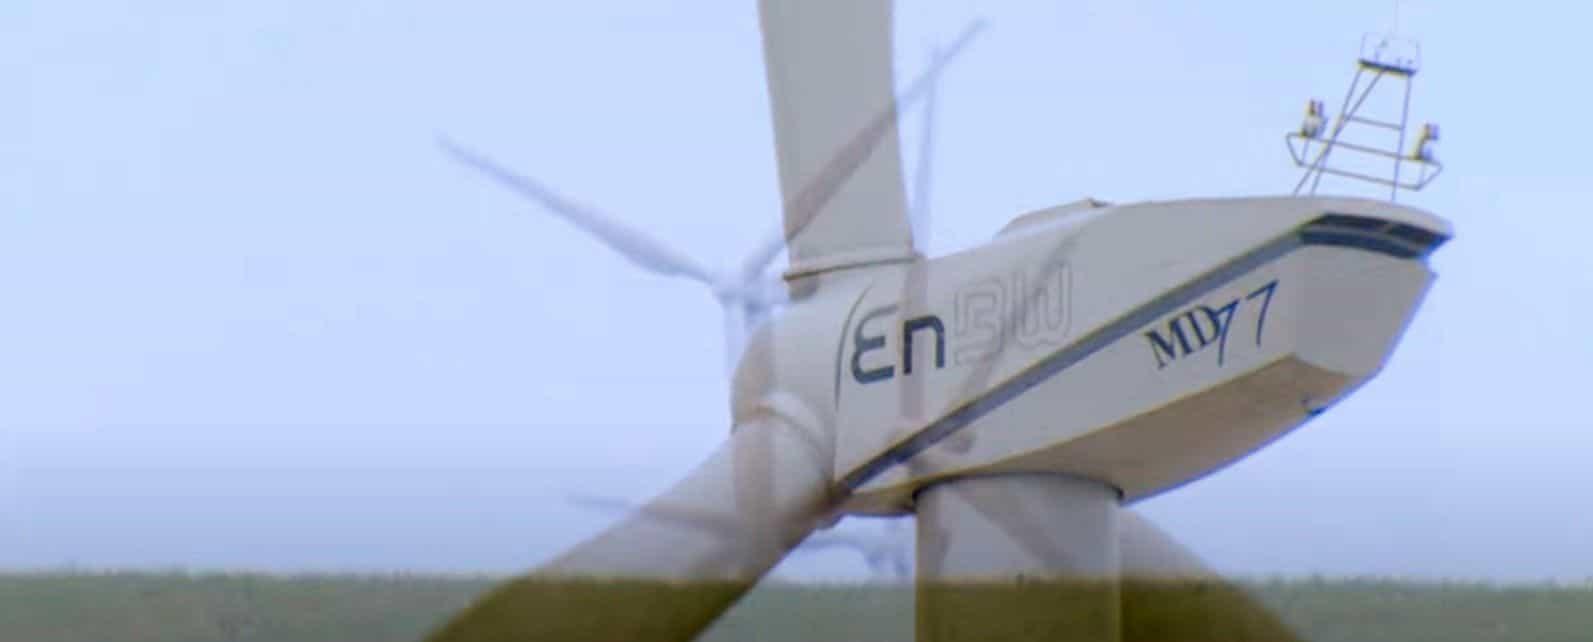 Elektrotechnik Elektroindustrie-Branche